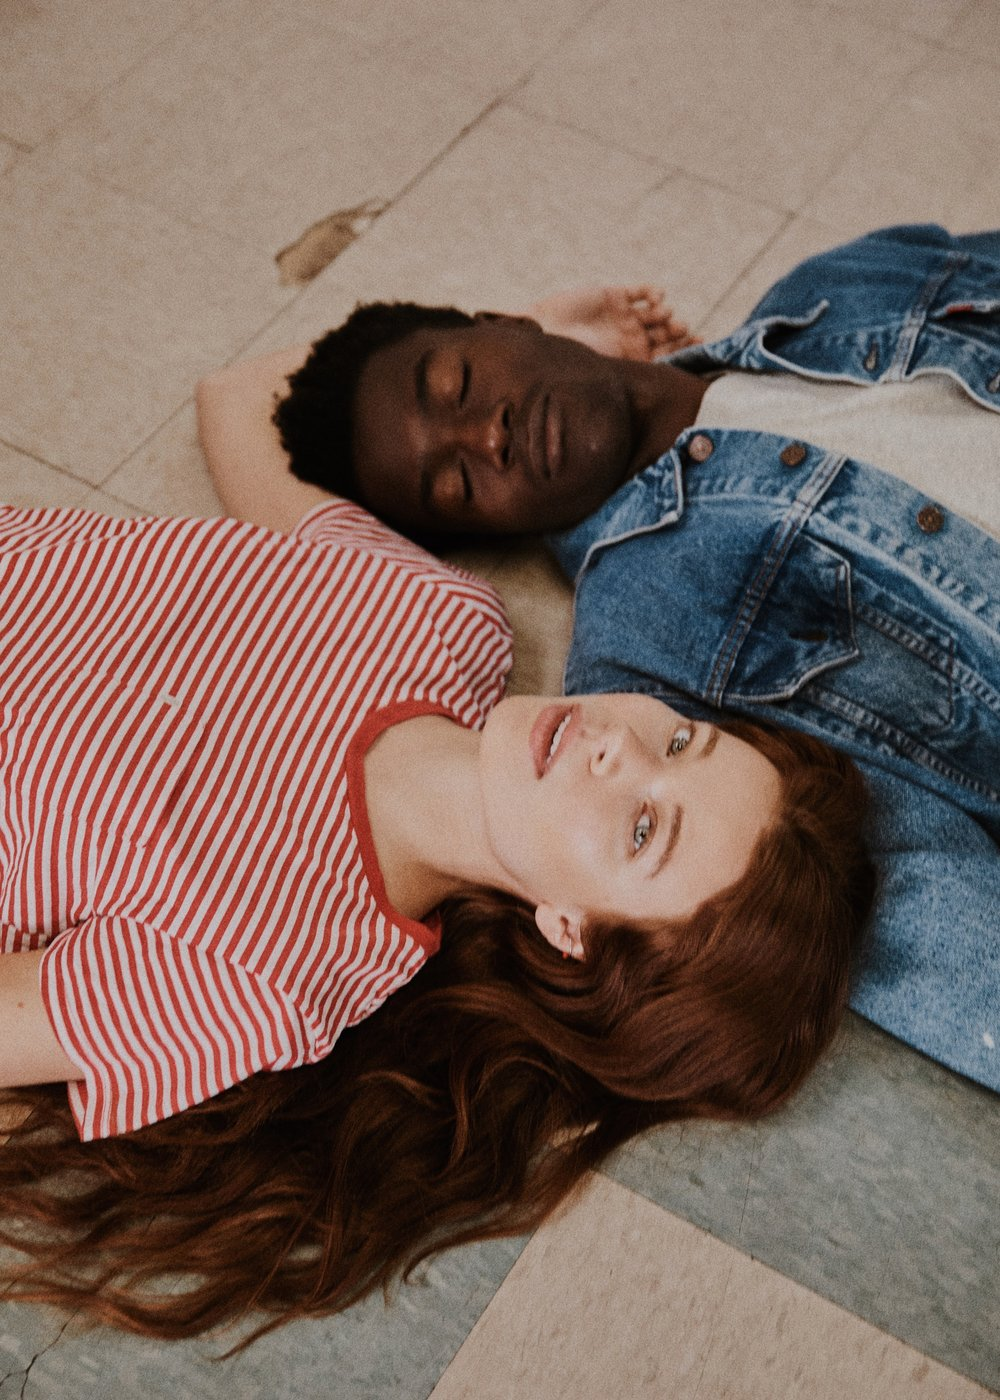 10_01_Laundromat-Arturo-Suzy-013_w.JPEG